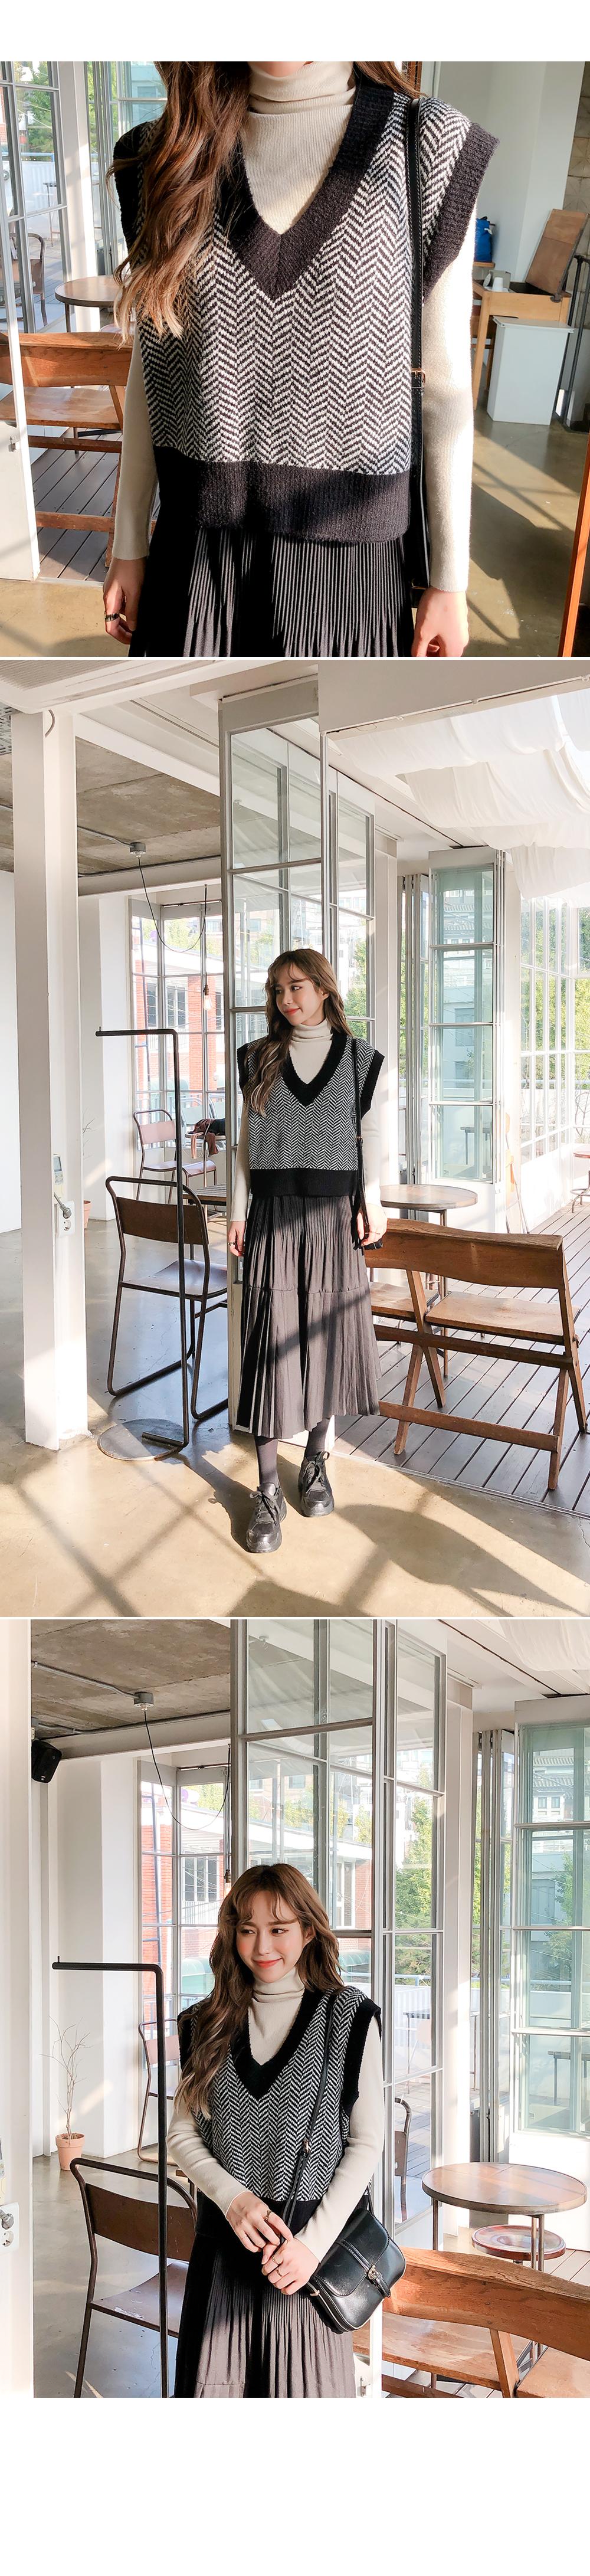 Herringbone knit vest